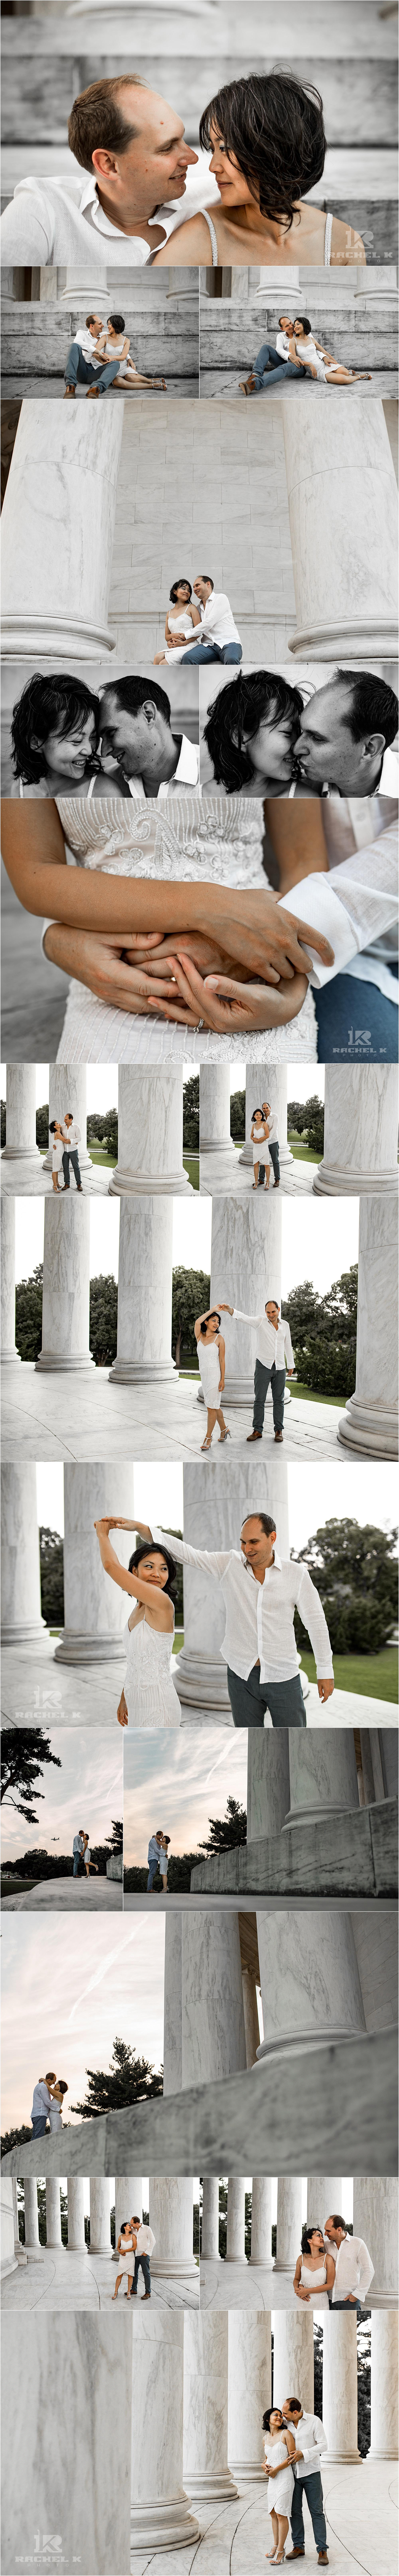 Jefferson memorial photography session by Rachel K Photo